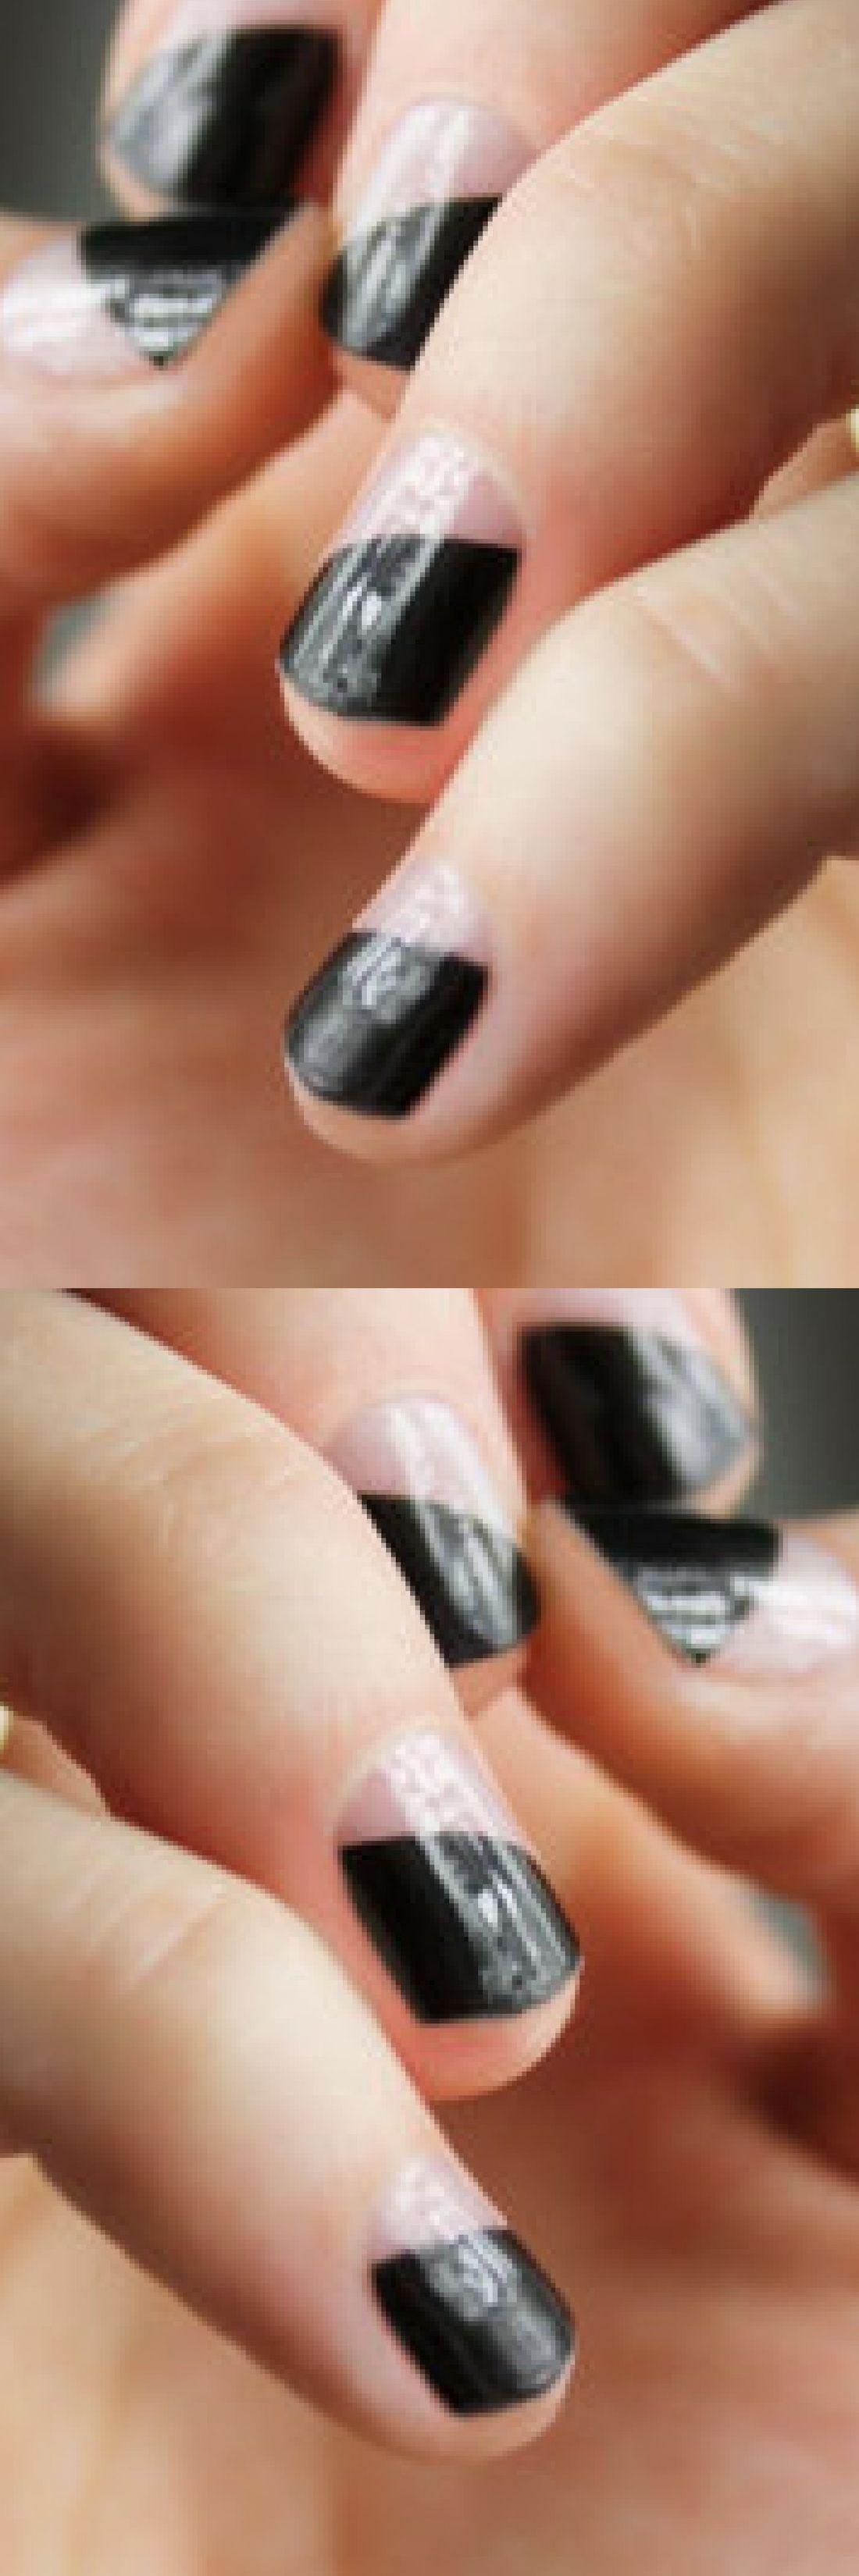 Black Modern French Nail Wraps. So Gloss Transparent Nail Wraps can ...